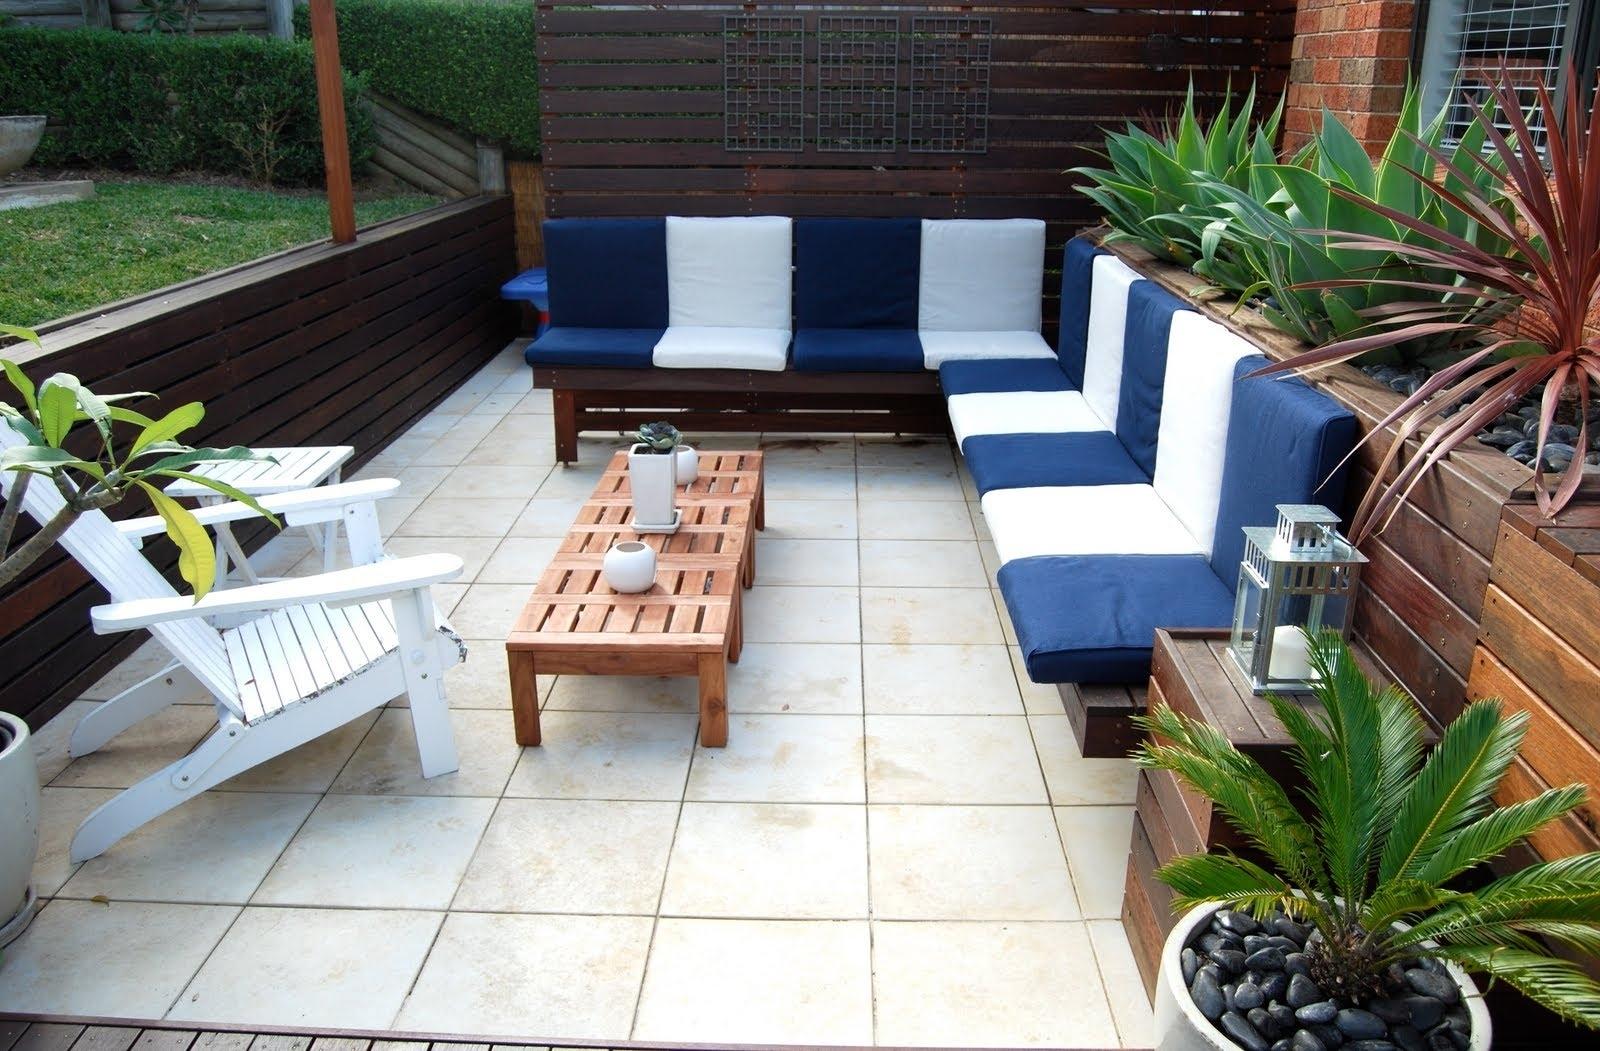 Ikea Patio Conversation Sets in Latest Garden Furniture Ikea~Ikea Garden Furniture Australia - Youtube